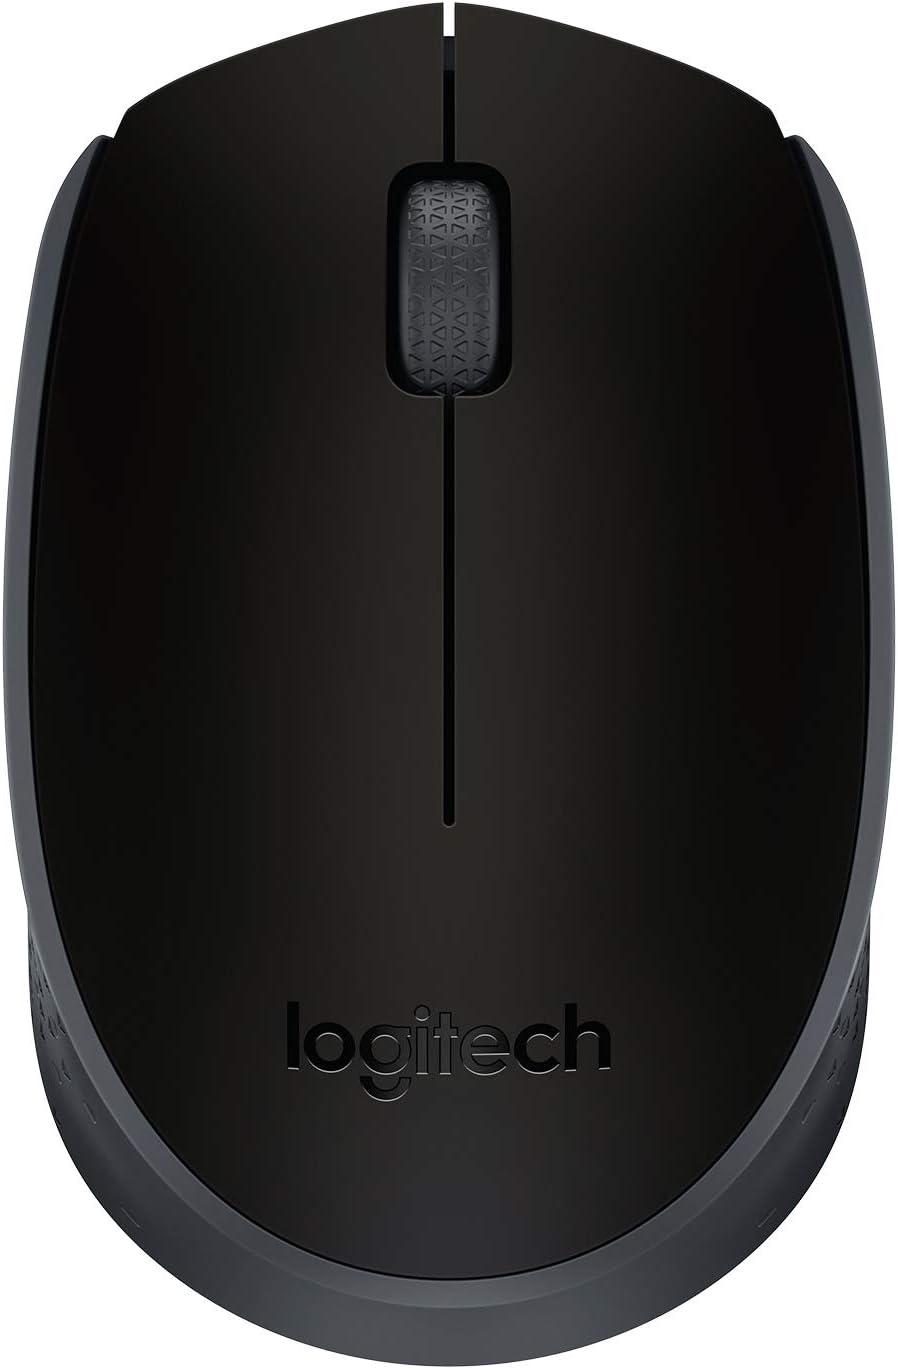 Logitech M171 Ratón Inalámbrico, 2,4 GHz con Nano Receptor USB, Seguimiento Óptico, Batería 12 Meses, Ambidiestro, PC/Mac/Portátil, Negro